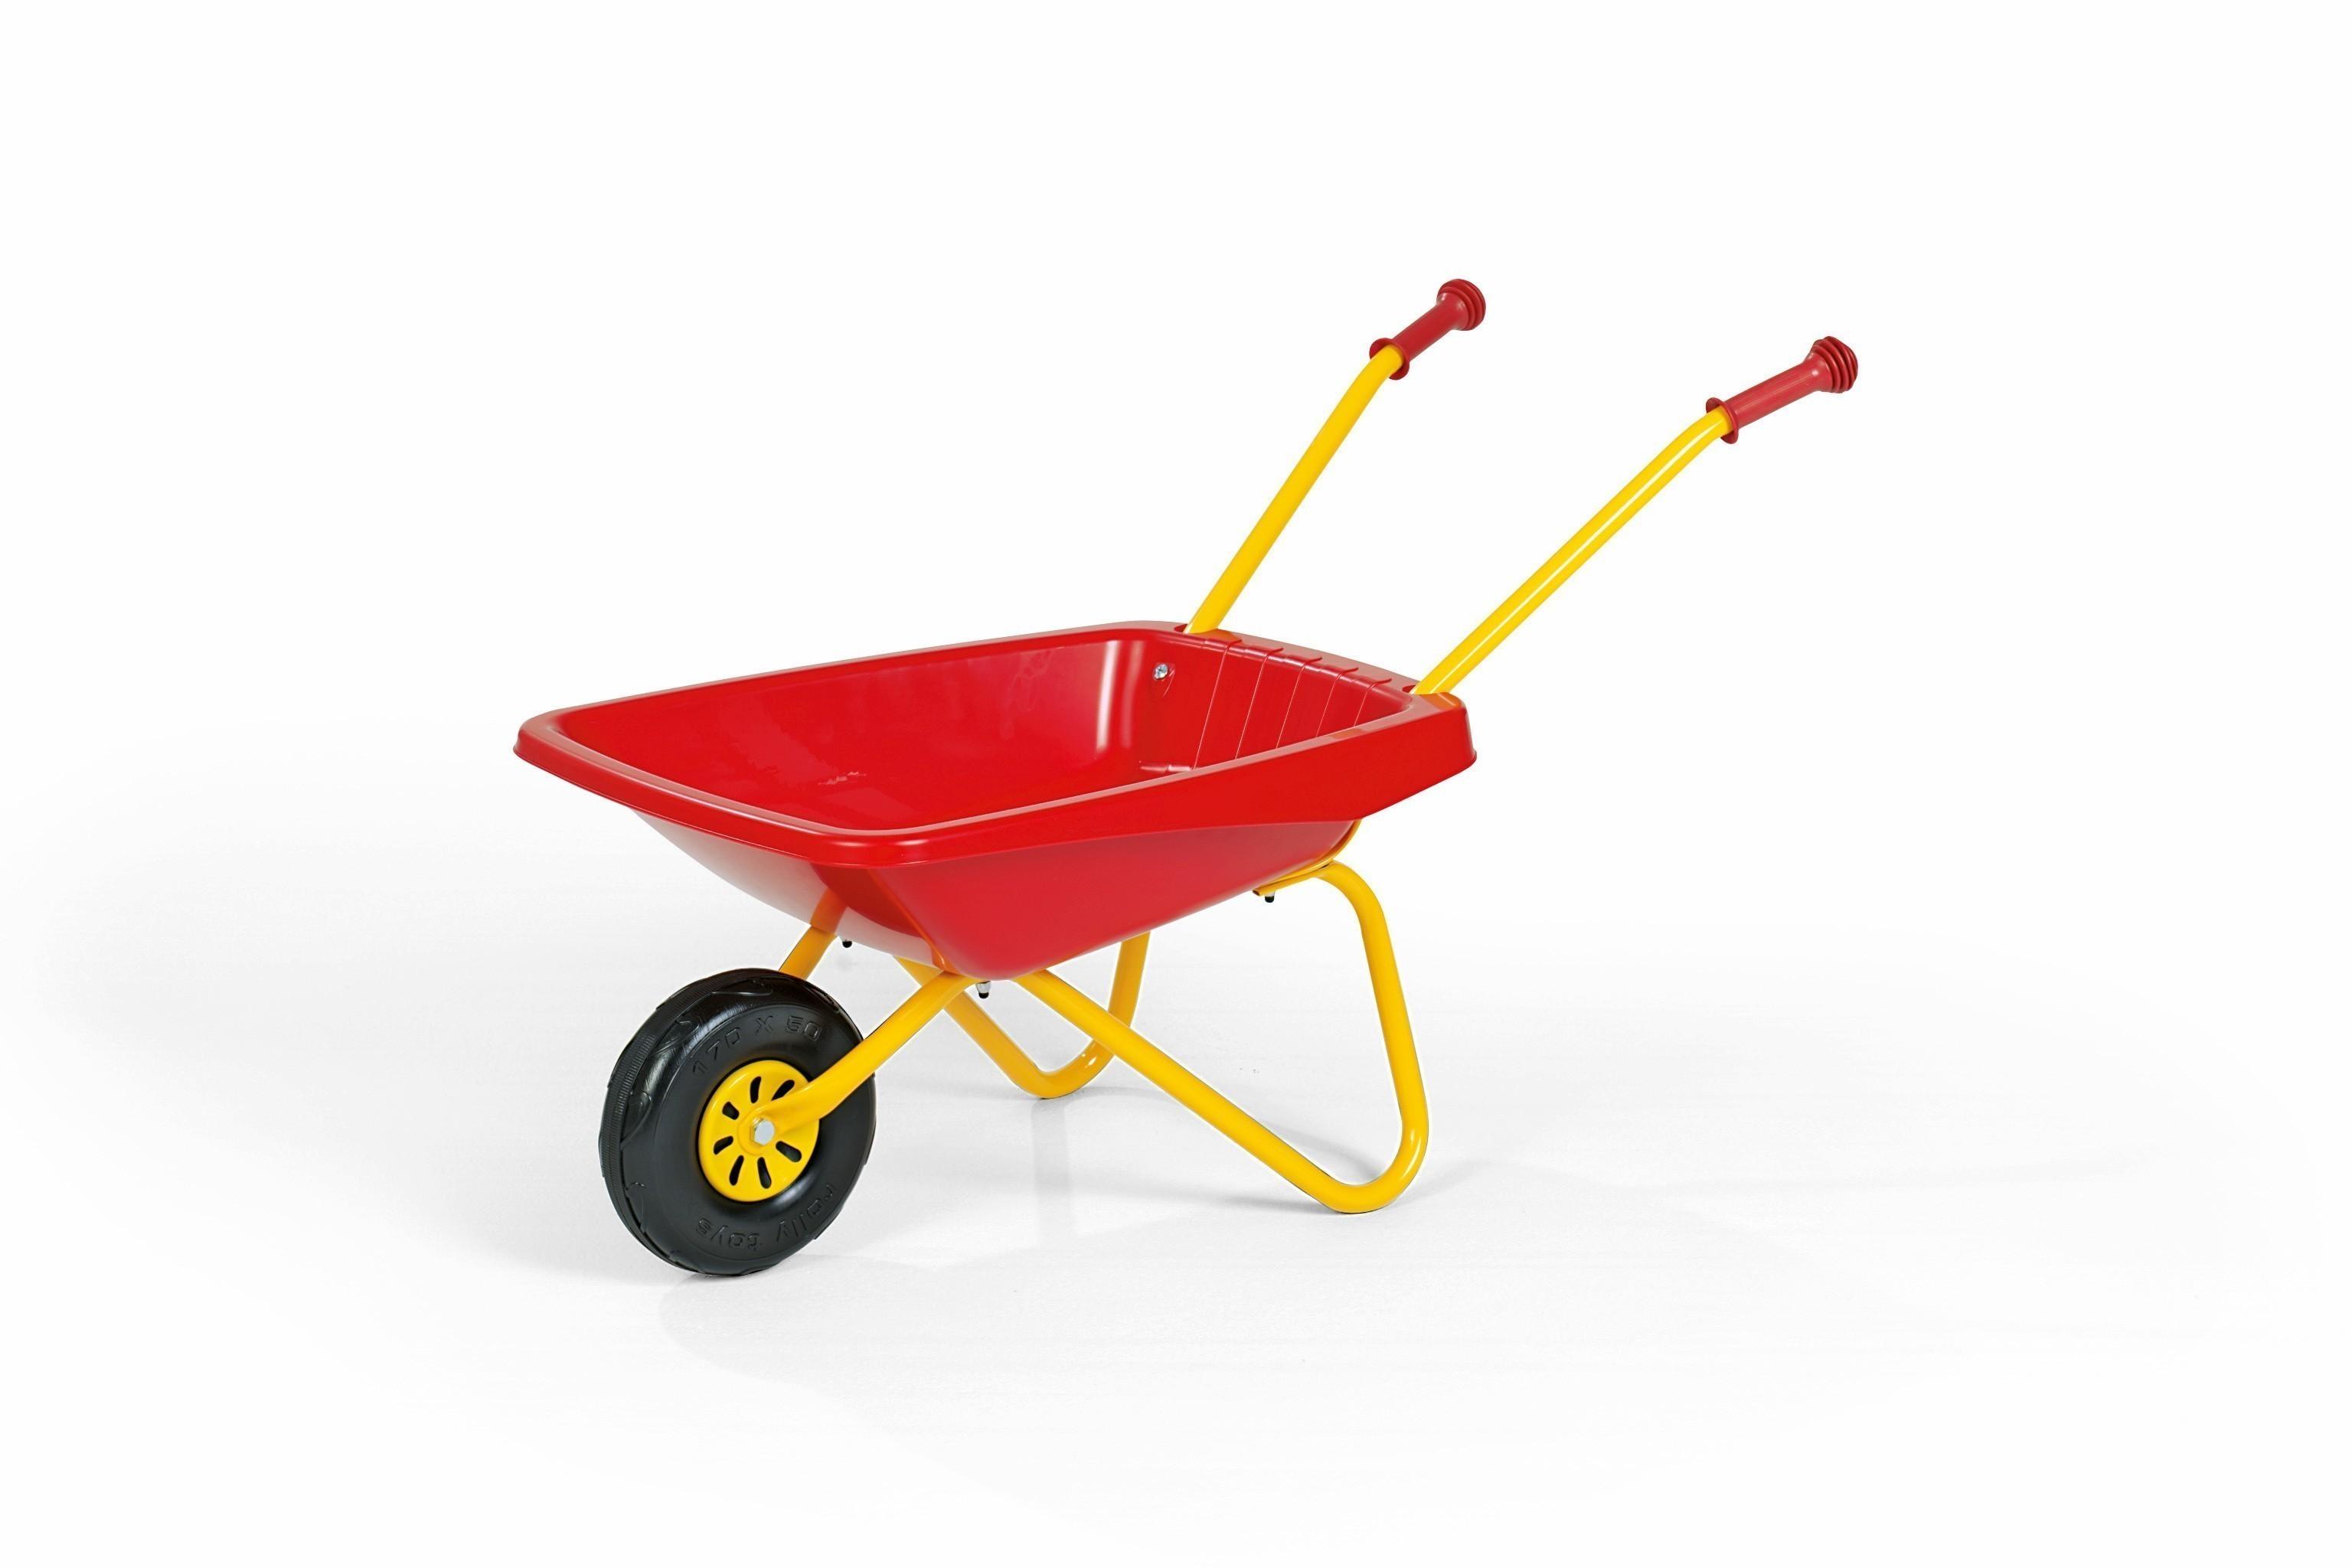 Schubkarre gelb / rot - Rolly Toys Bild 1